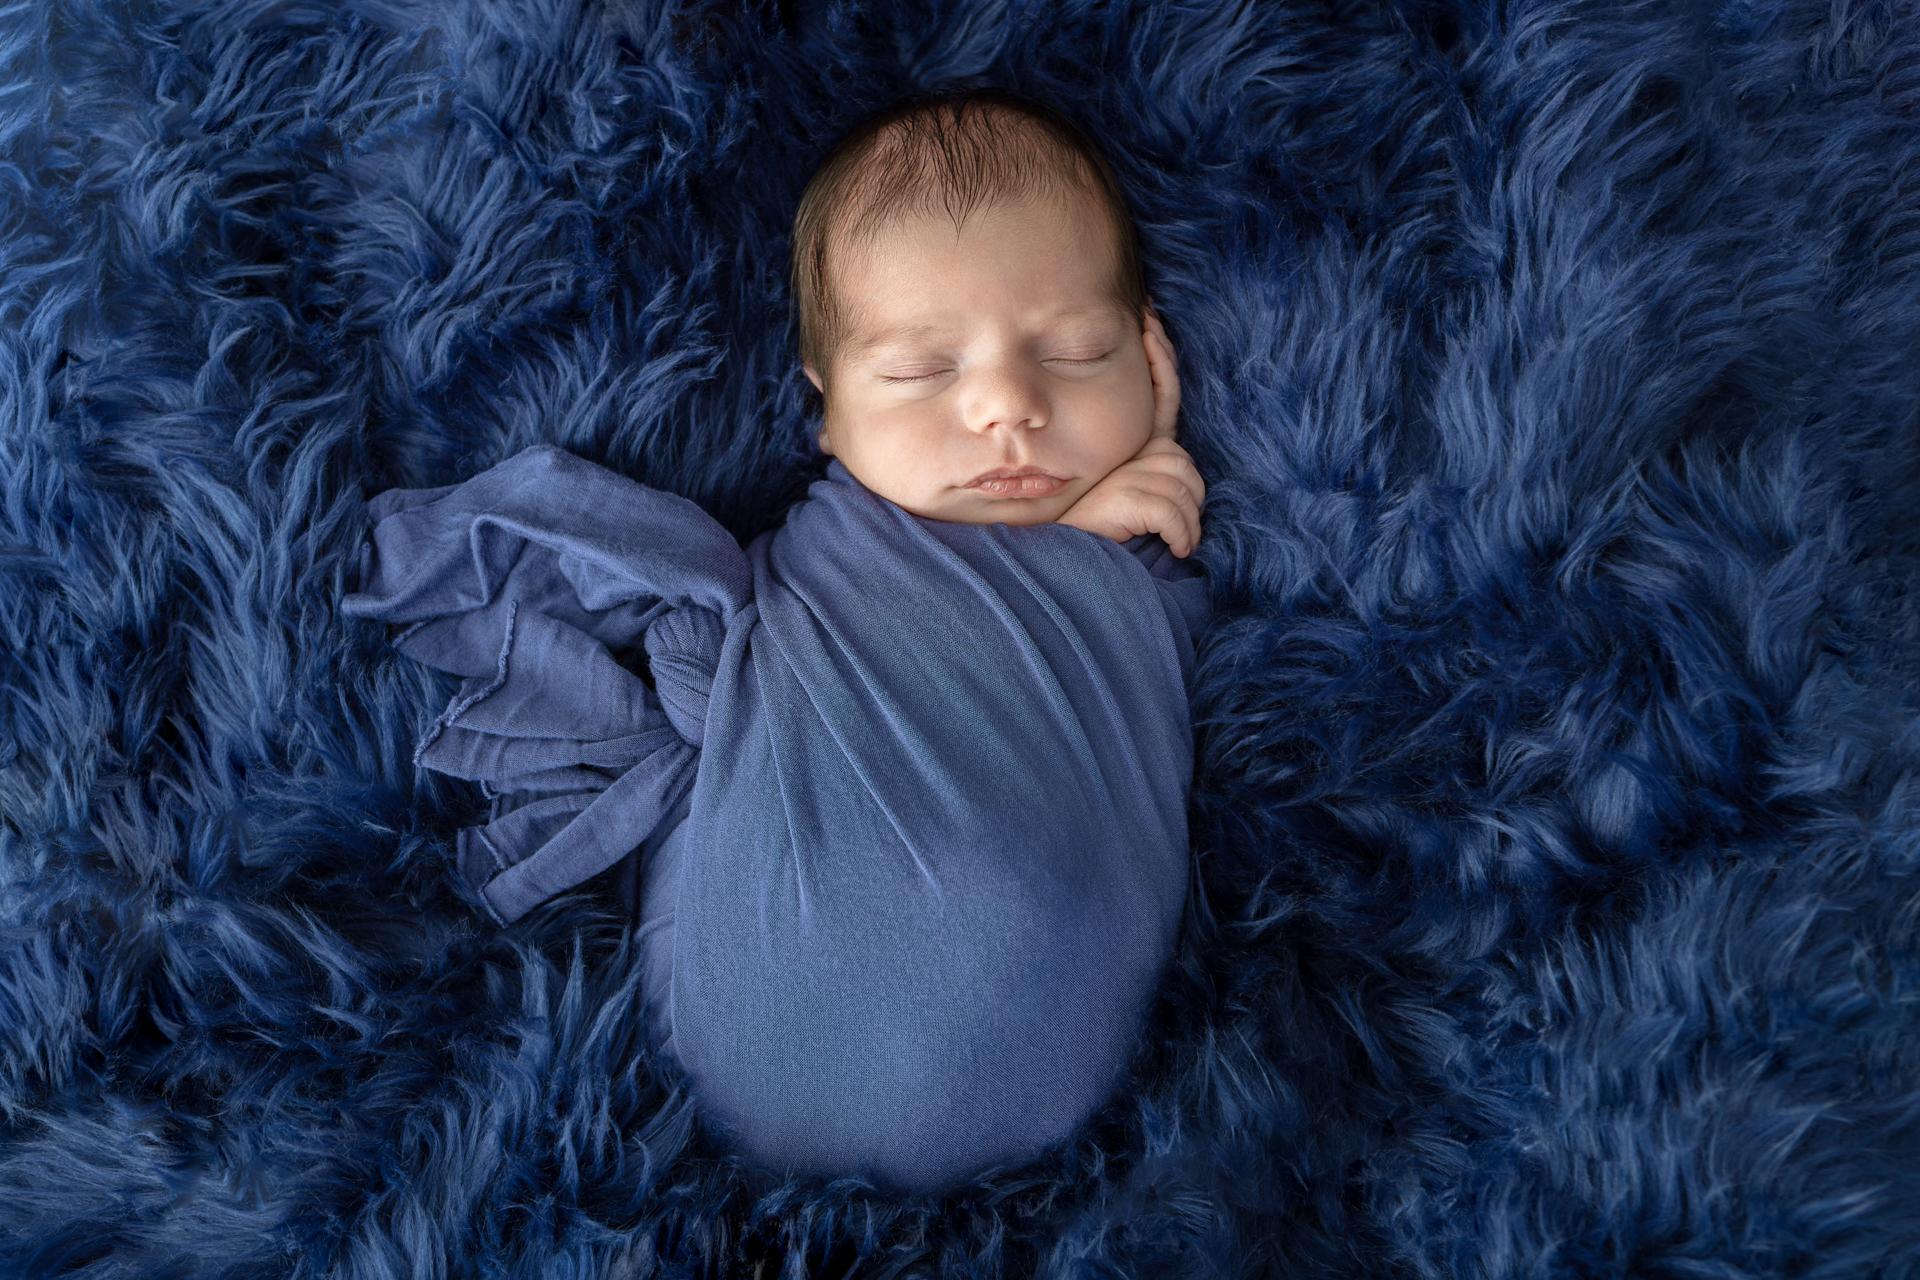 newborn baby boy swaddled in lightweight navy swaddle on a navy flokati